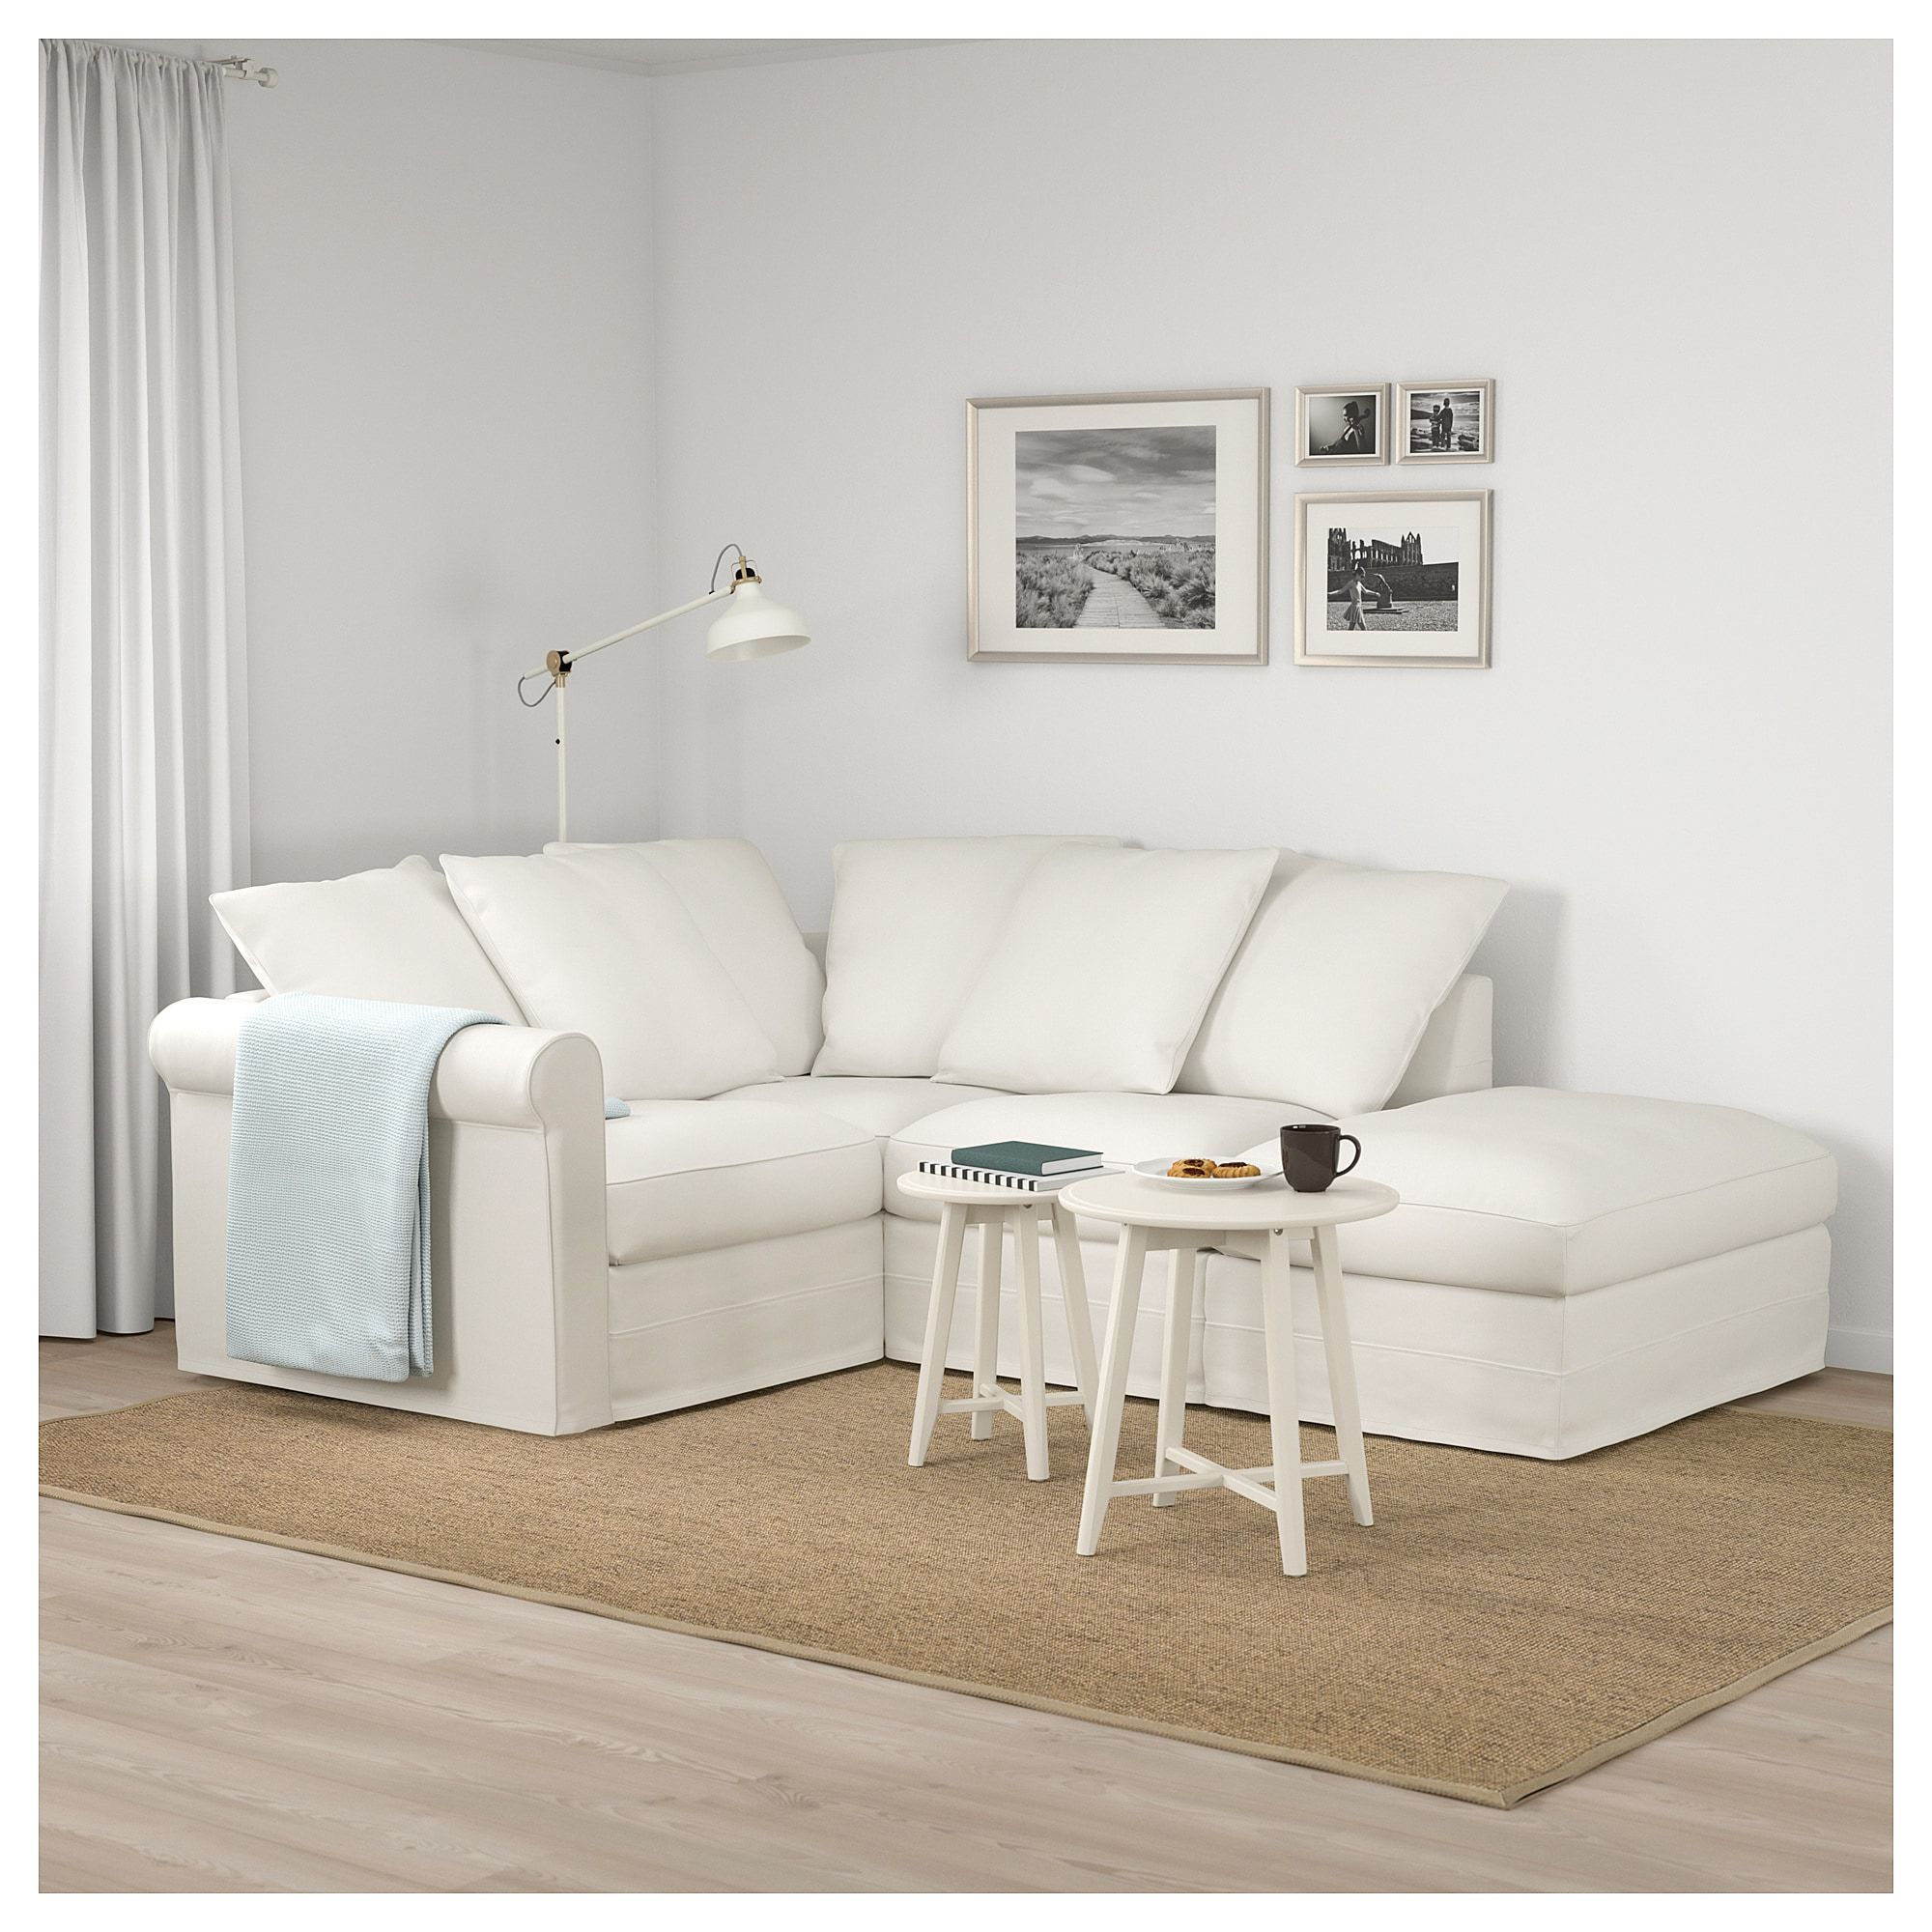 Furniture and Home Furnishings | Corner sofa, Deep seat ...